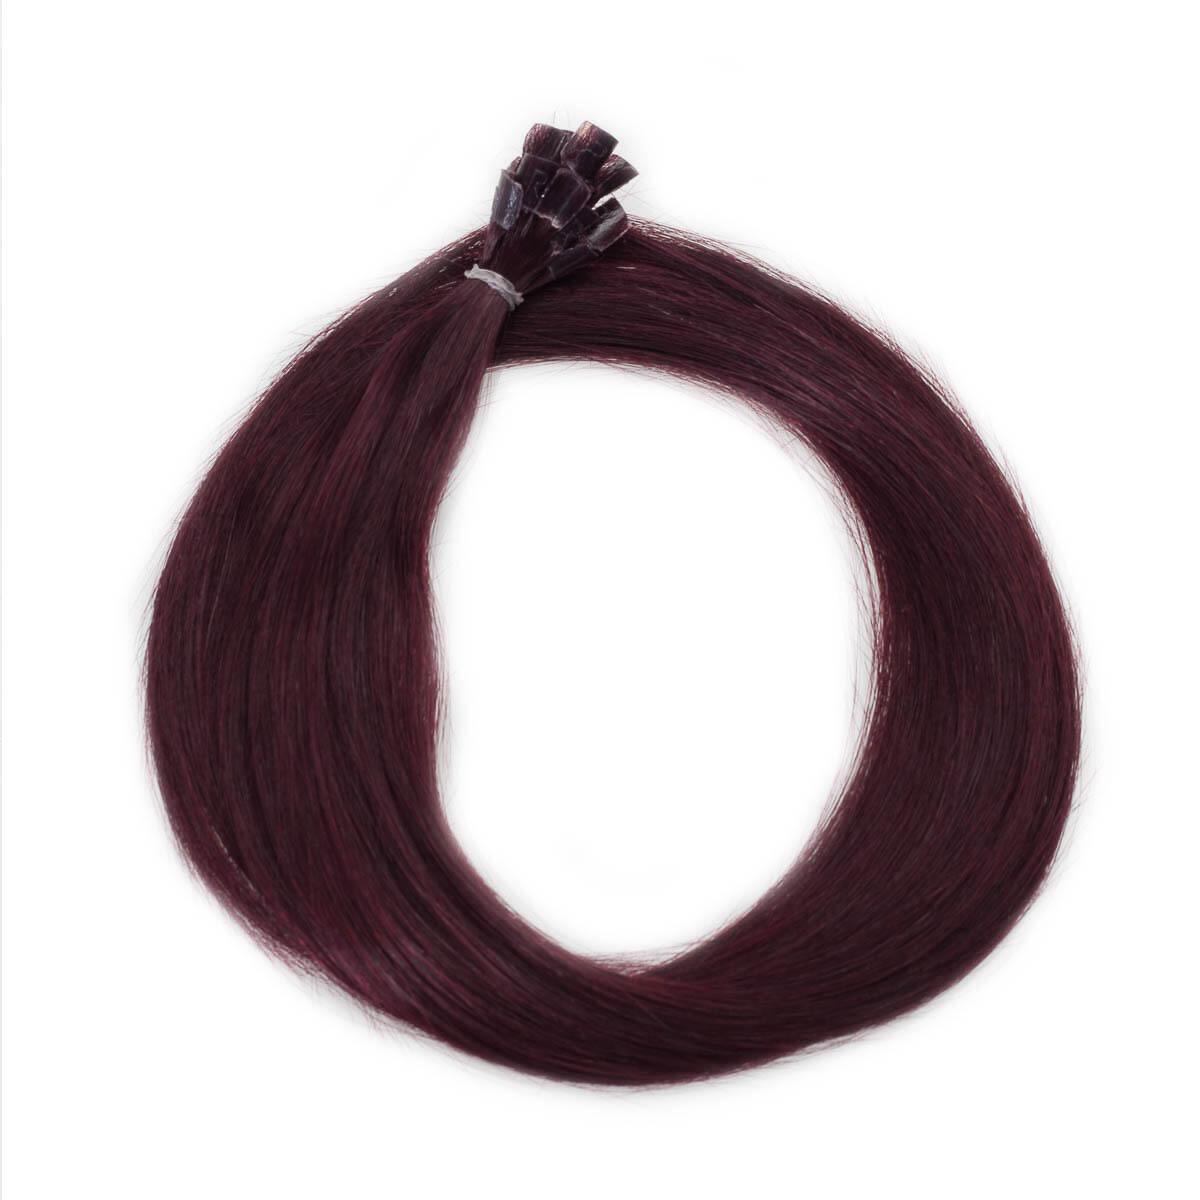 Nail Hair Original 6.12 Dark Mahogany Brown 30 cm